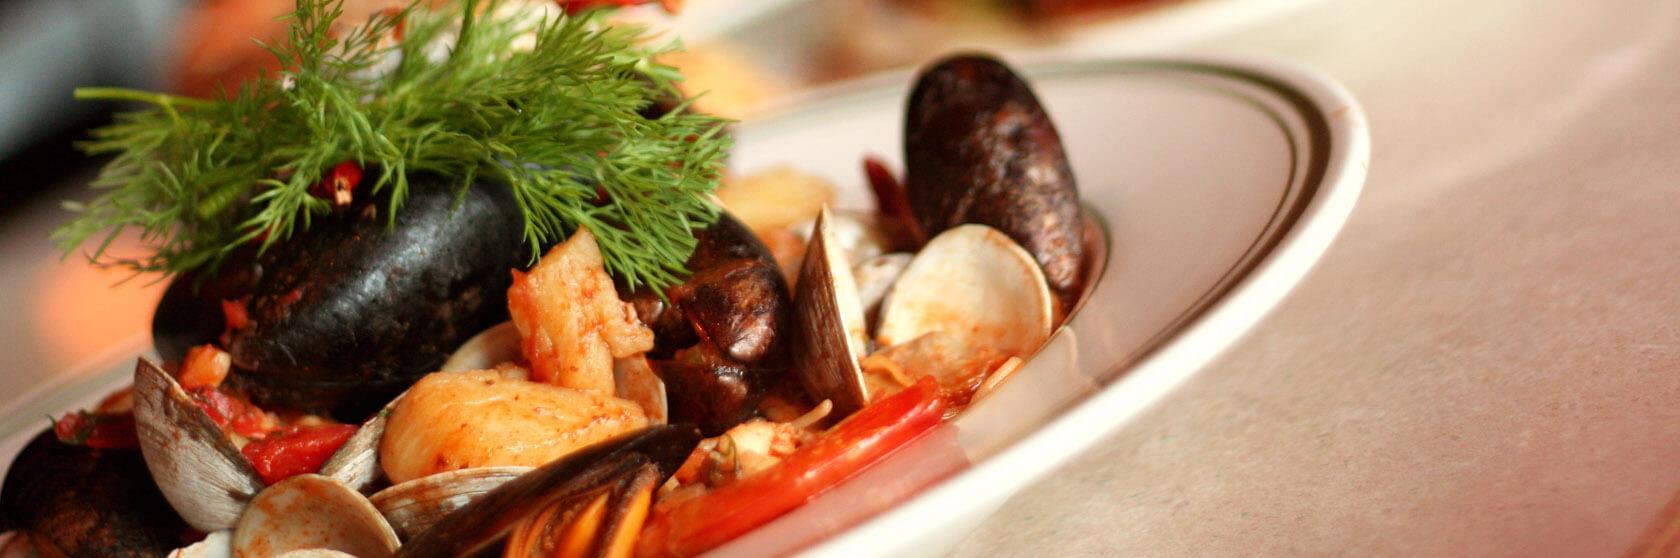 Pauls-Deli-Dinner-Specials